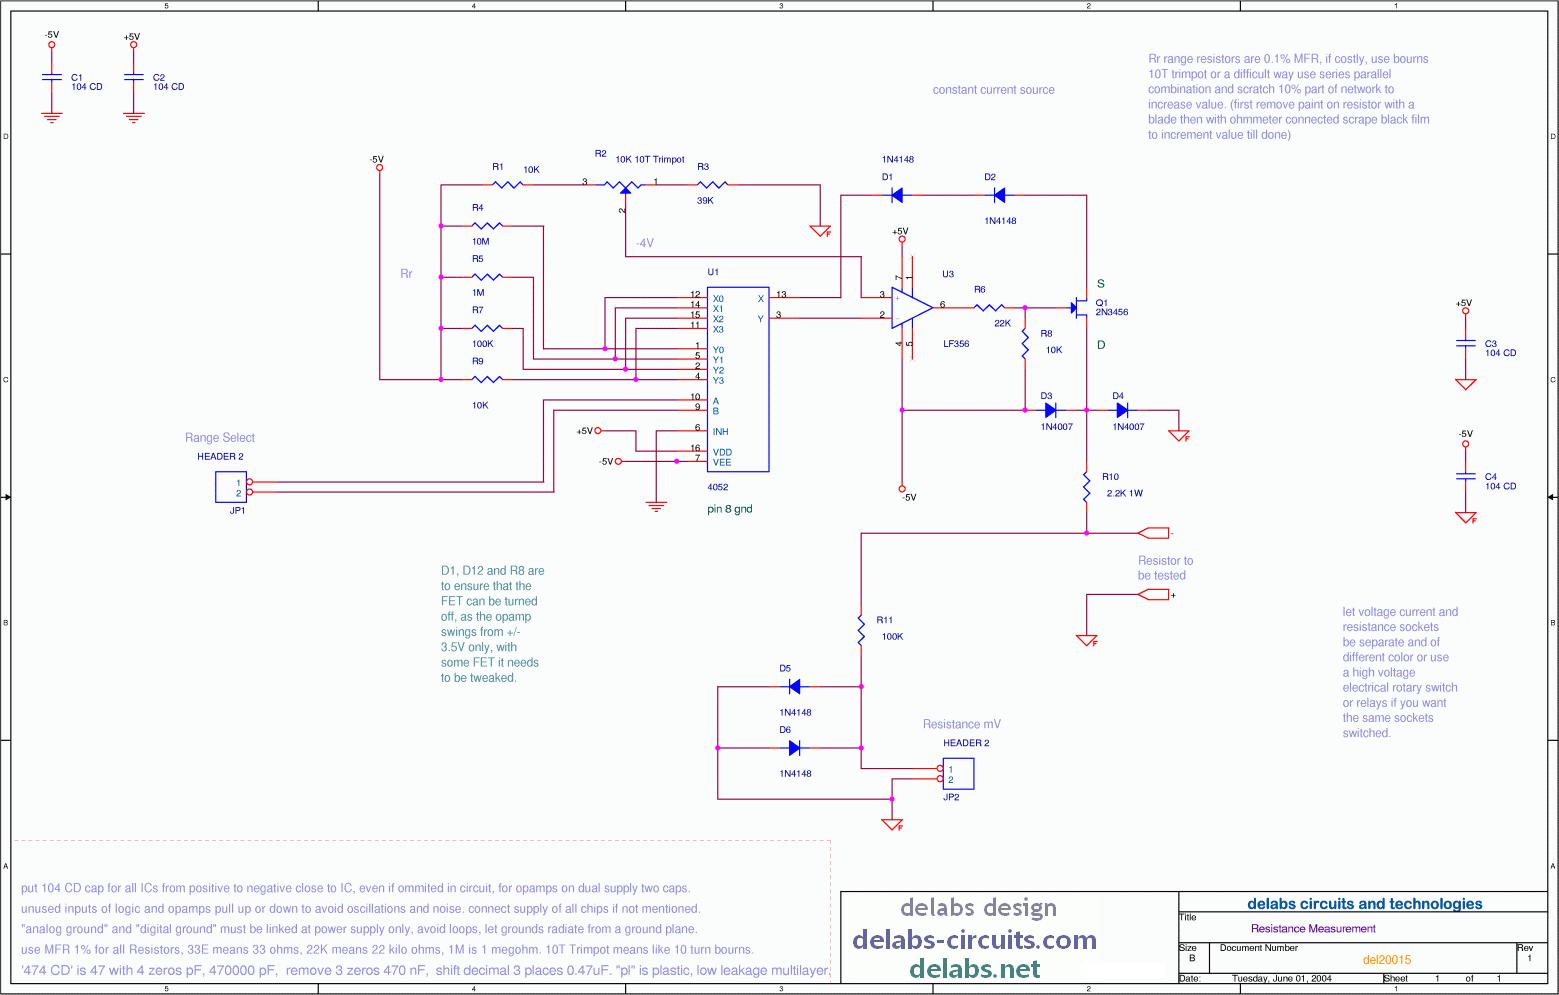 resistance measurement with current source del20015 rh delabs circuits com